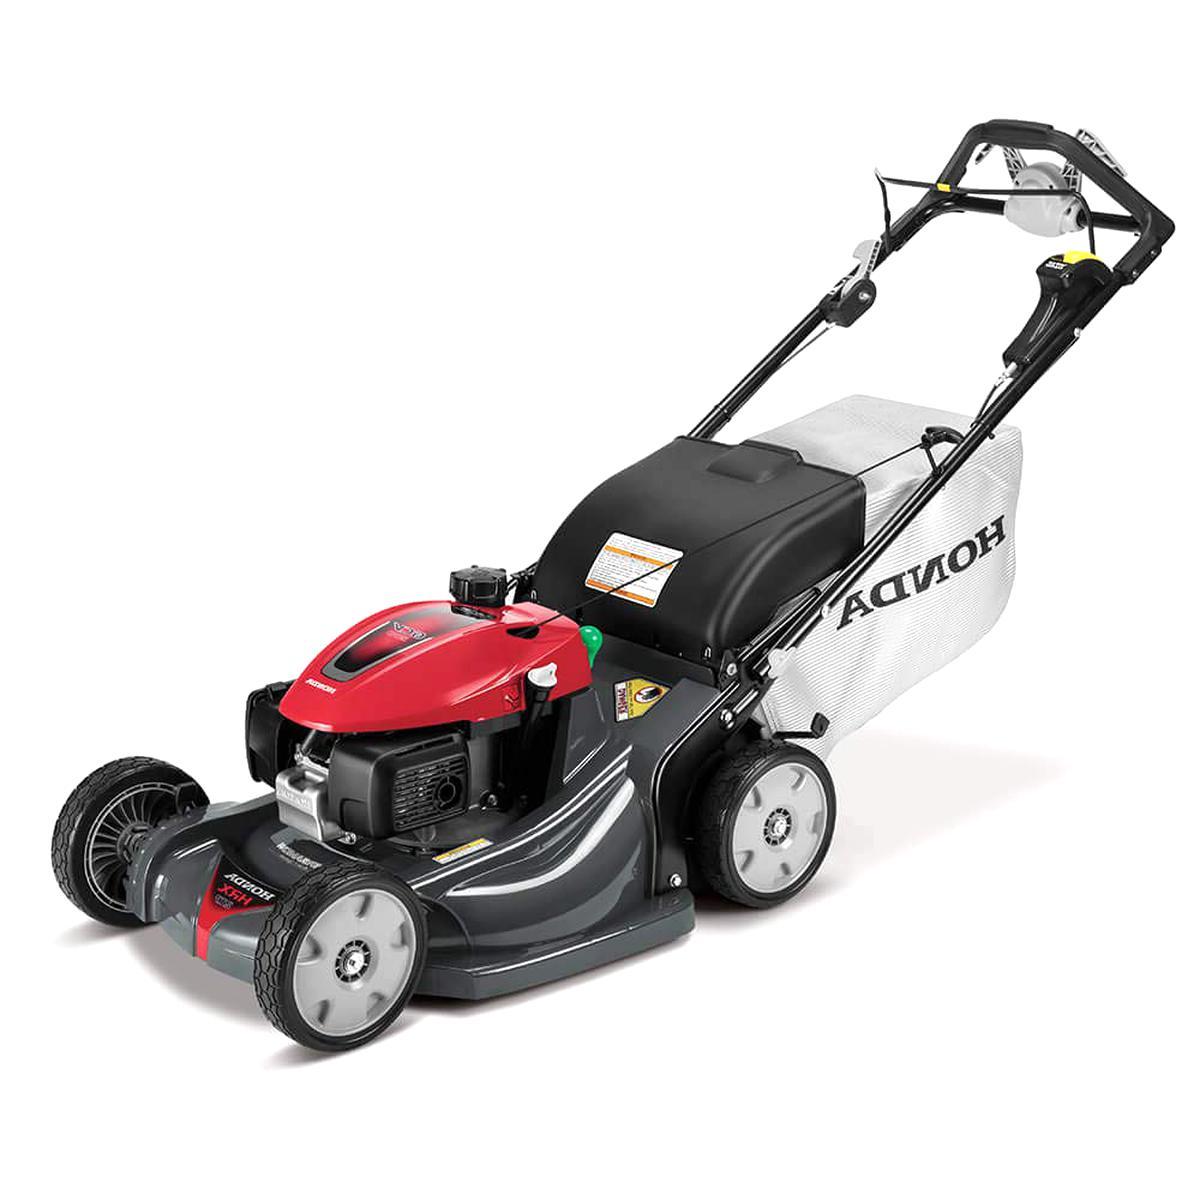 honda lawn mower for sale